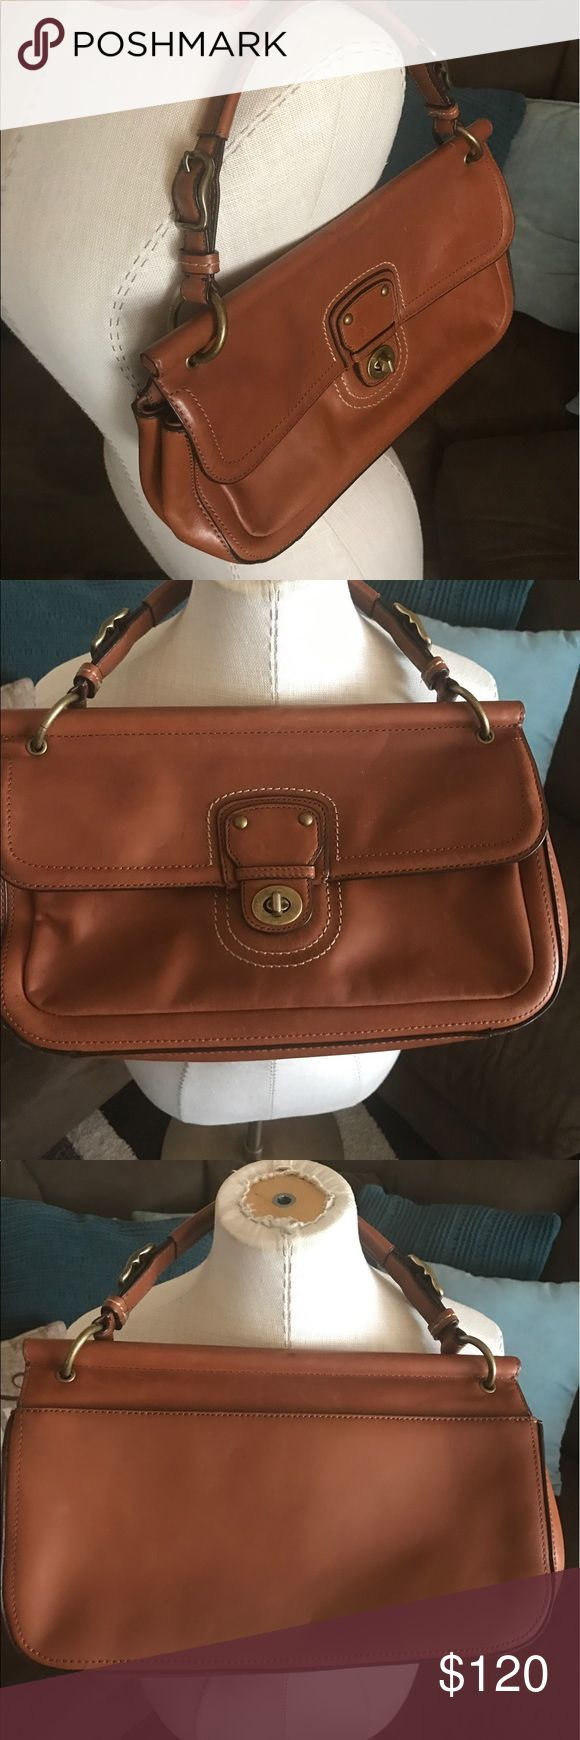 COACH Leather Purse Beautiful Coach leather handbag Coach Bags